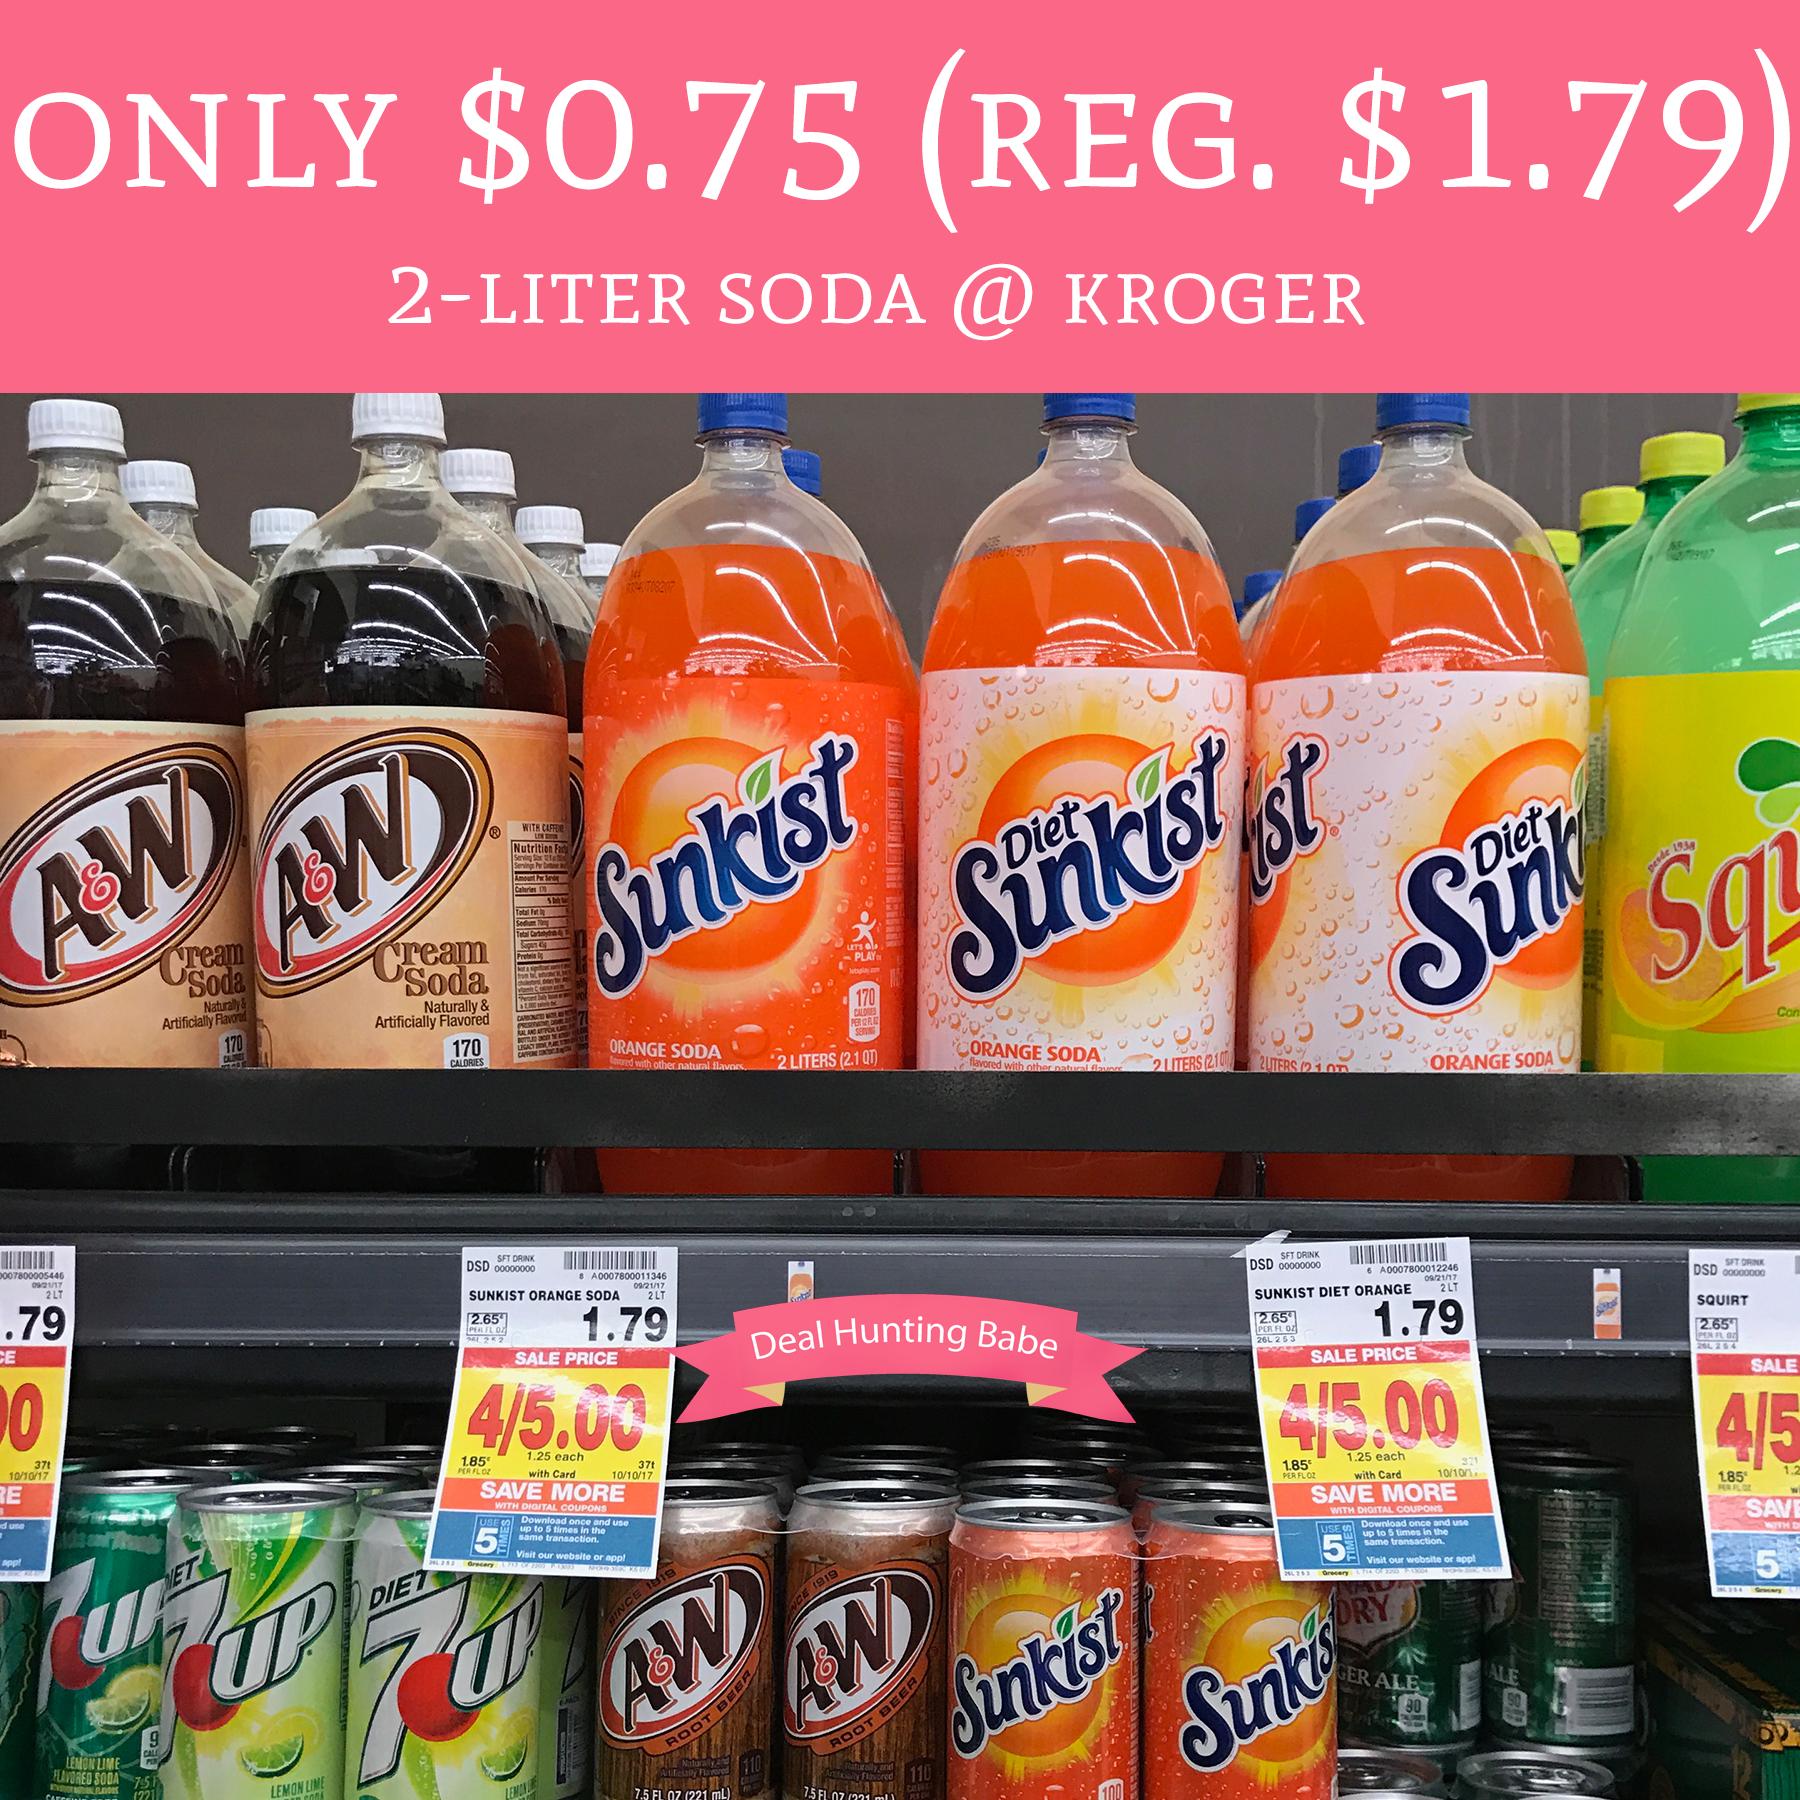 Only $0 75 (Regular $1 79) 2-Liter Soda @ Kroger - Deal Hunting Babe